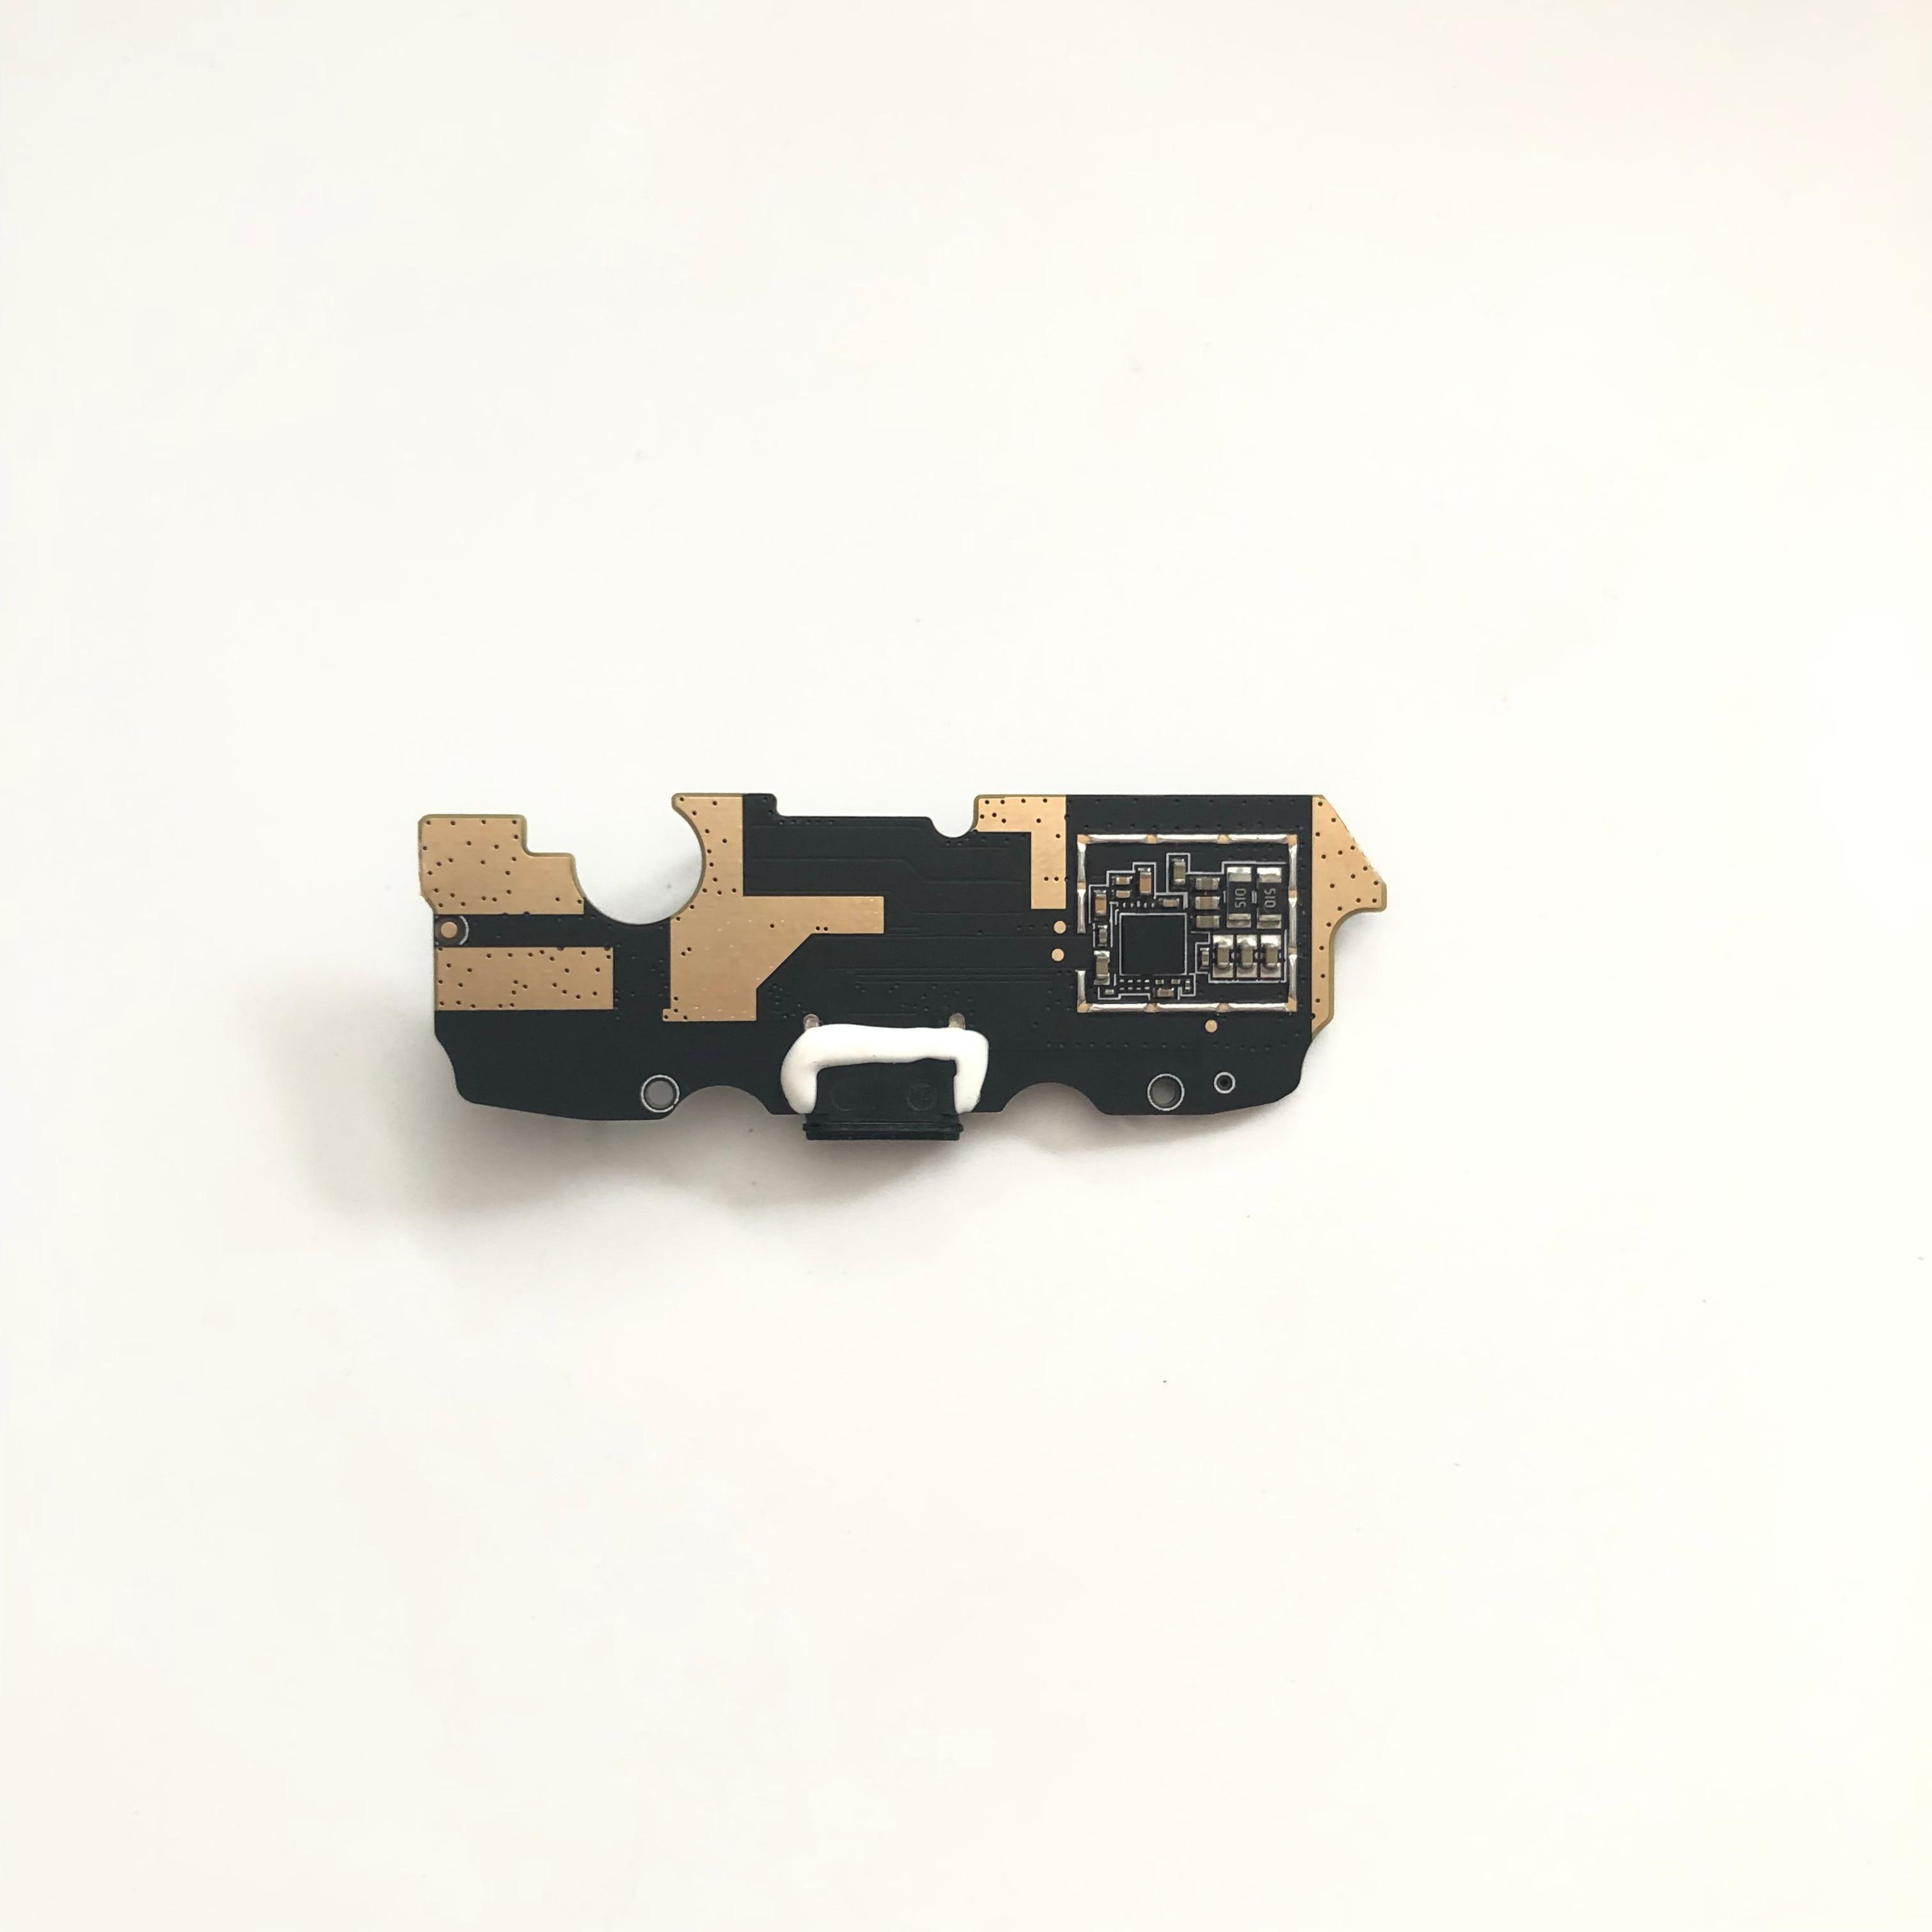 BLACKVIEW Charge-Board Usb-Plug Mobile-Phone Original for BV6800 Pro Mt6750t/octa-Core